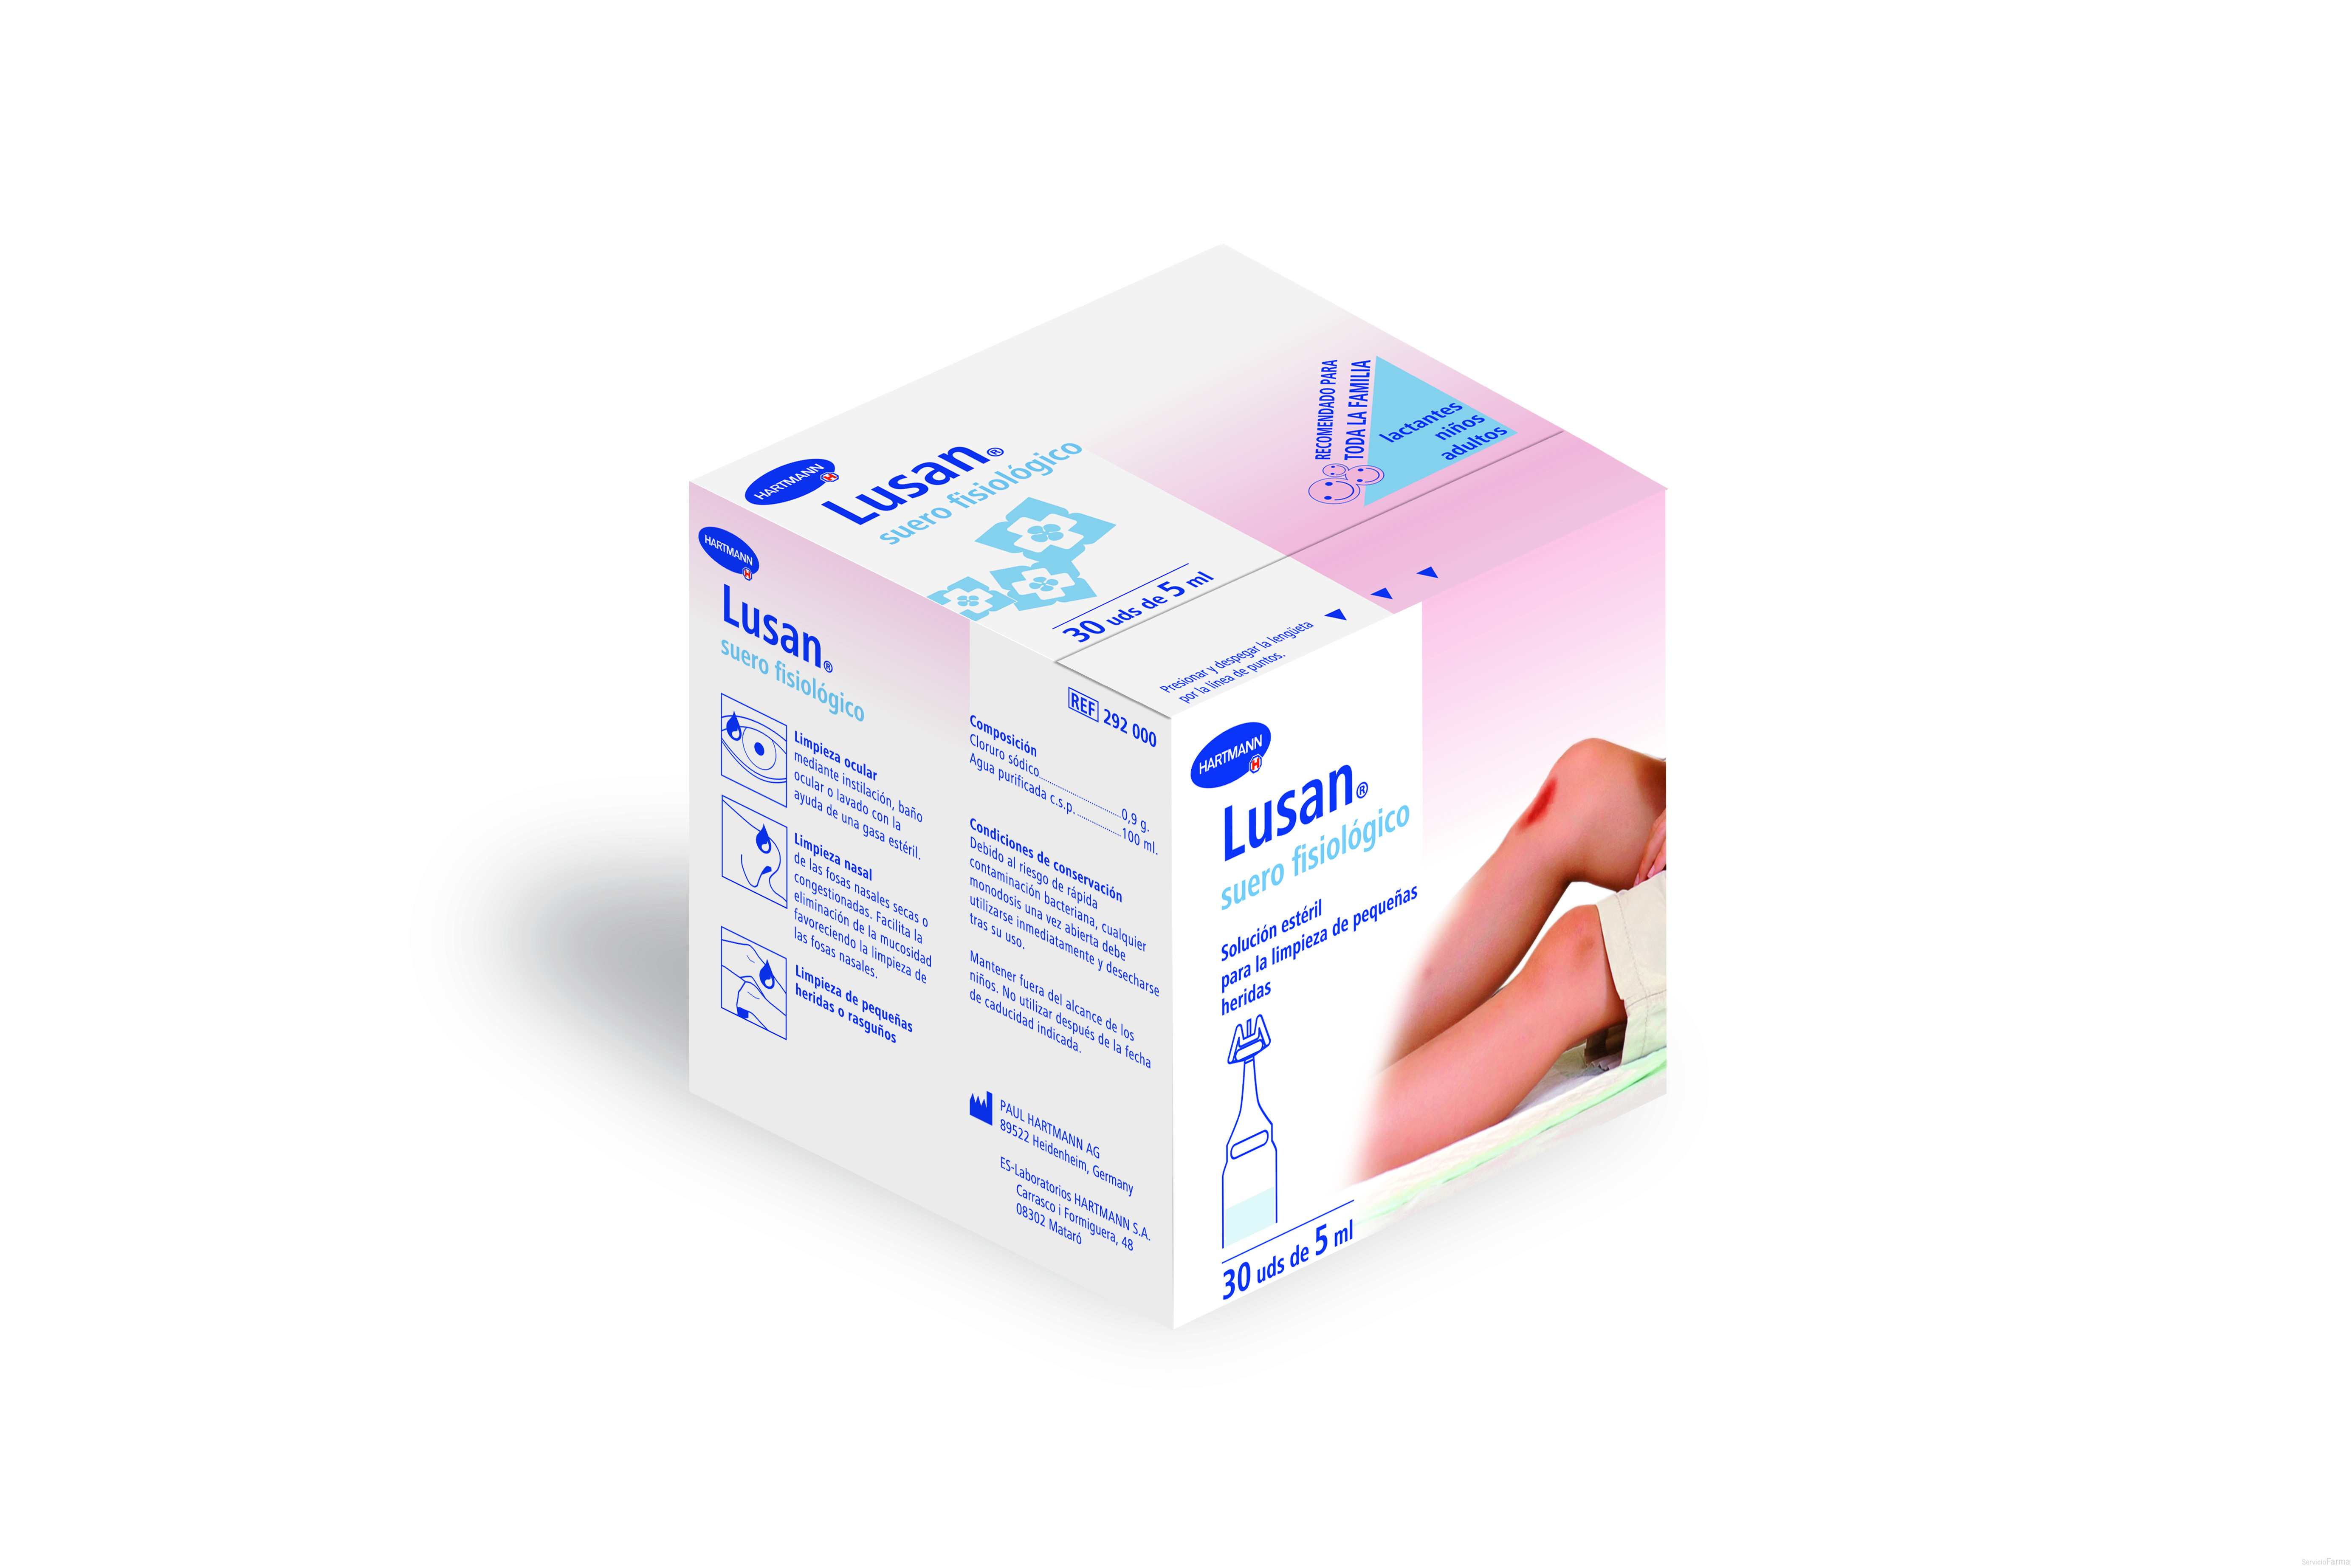 Hartmann Suero Fisiológico Lusan 30 Ud de 5 ml